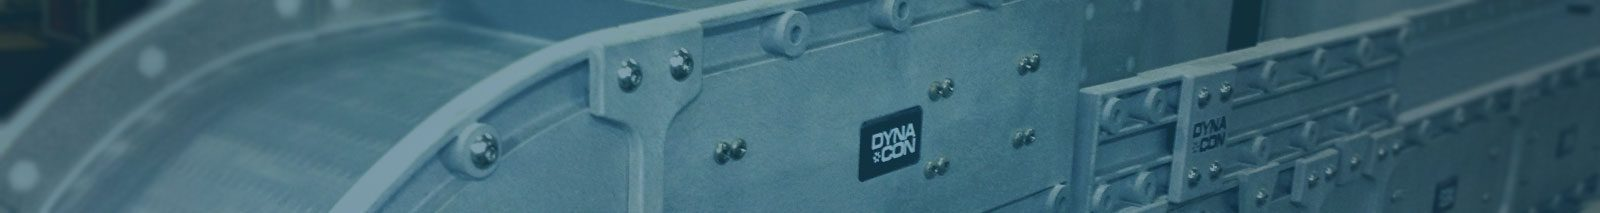 DynaCon modular conveyors